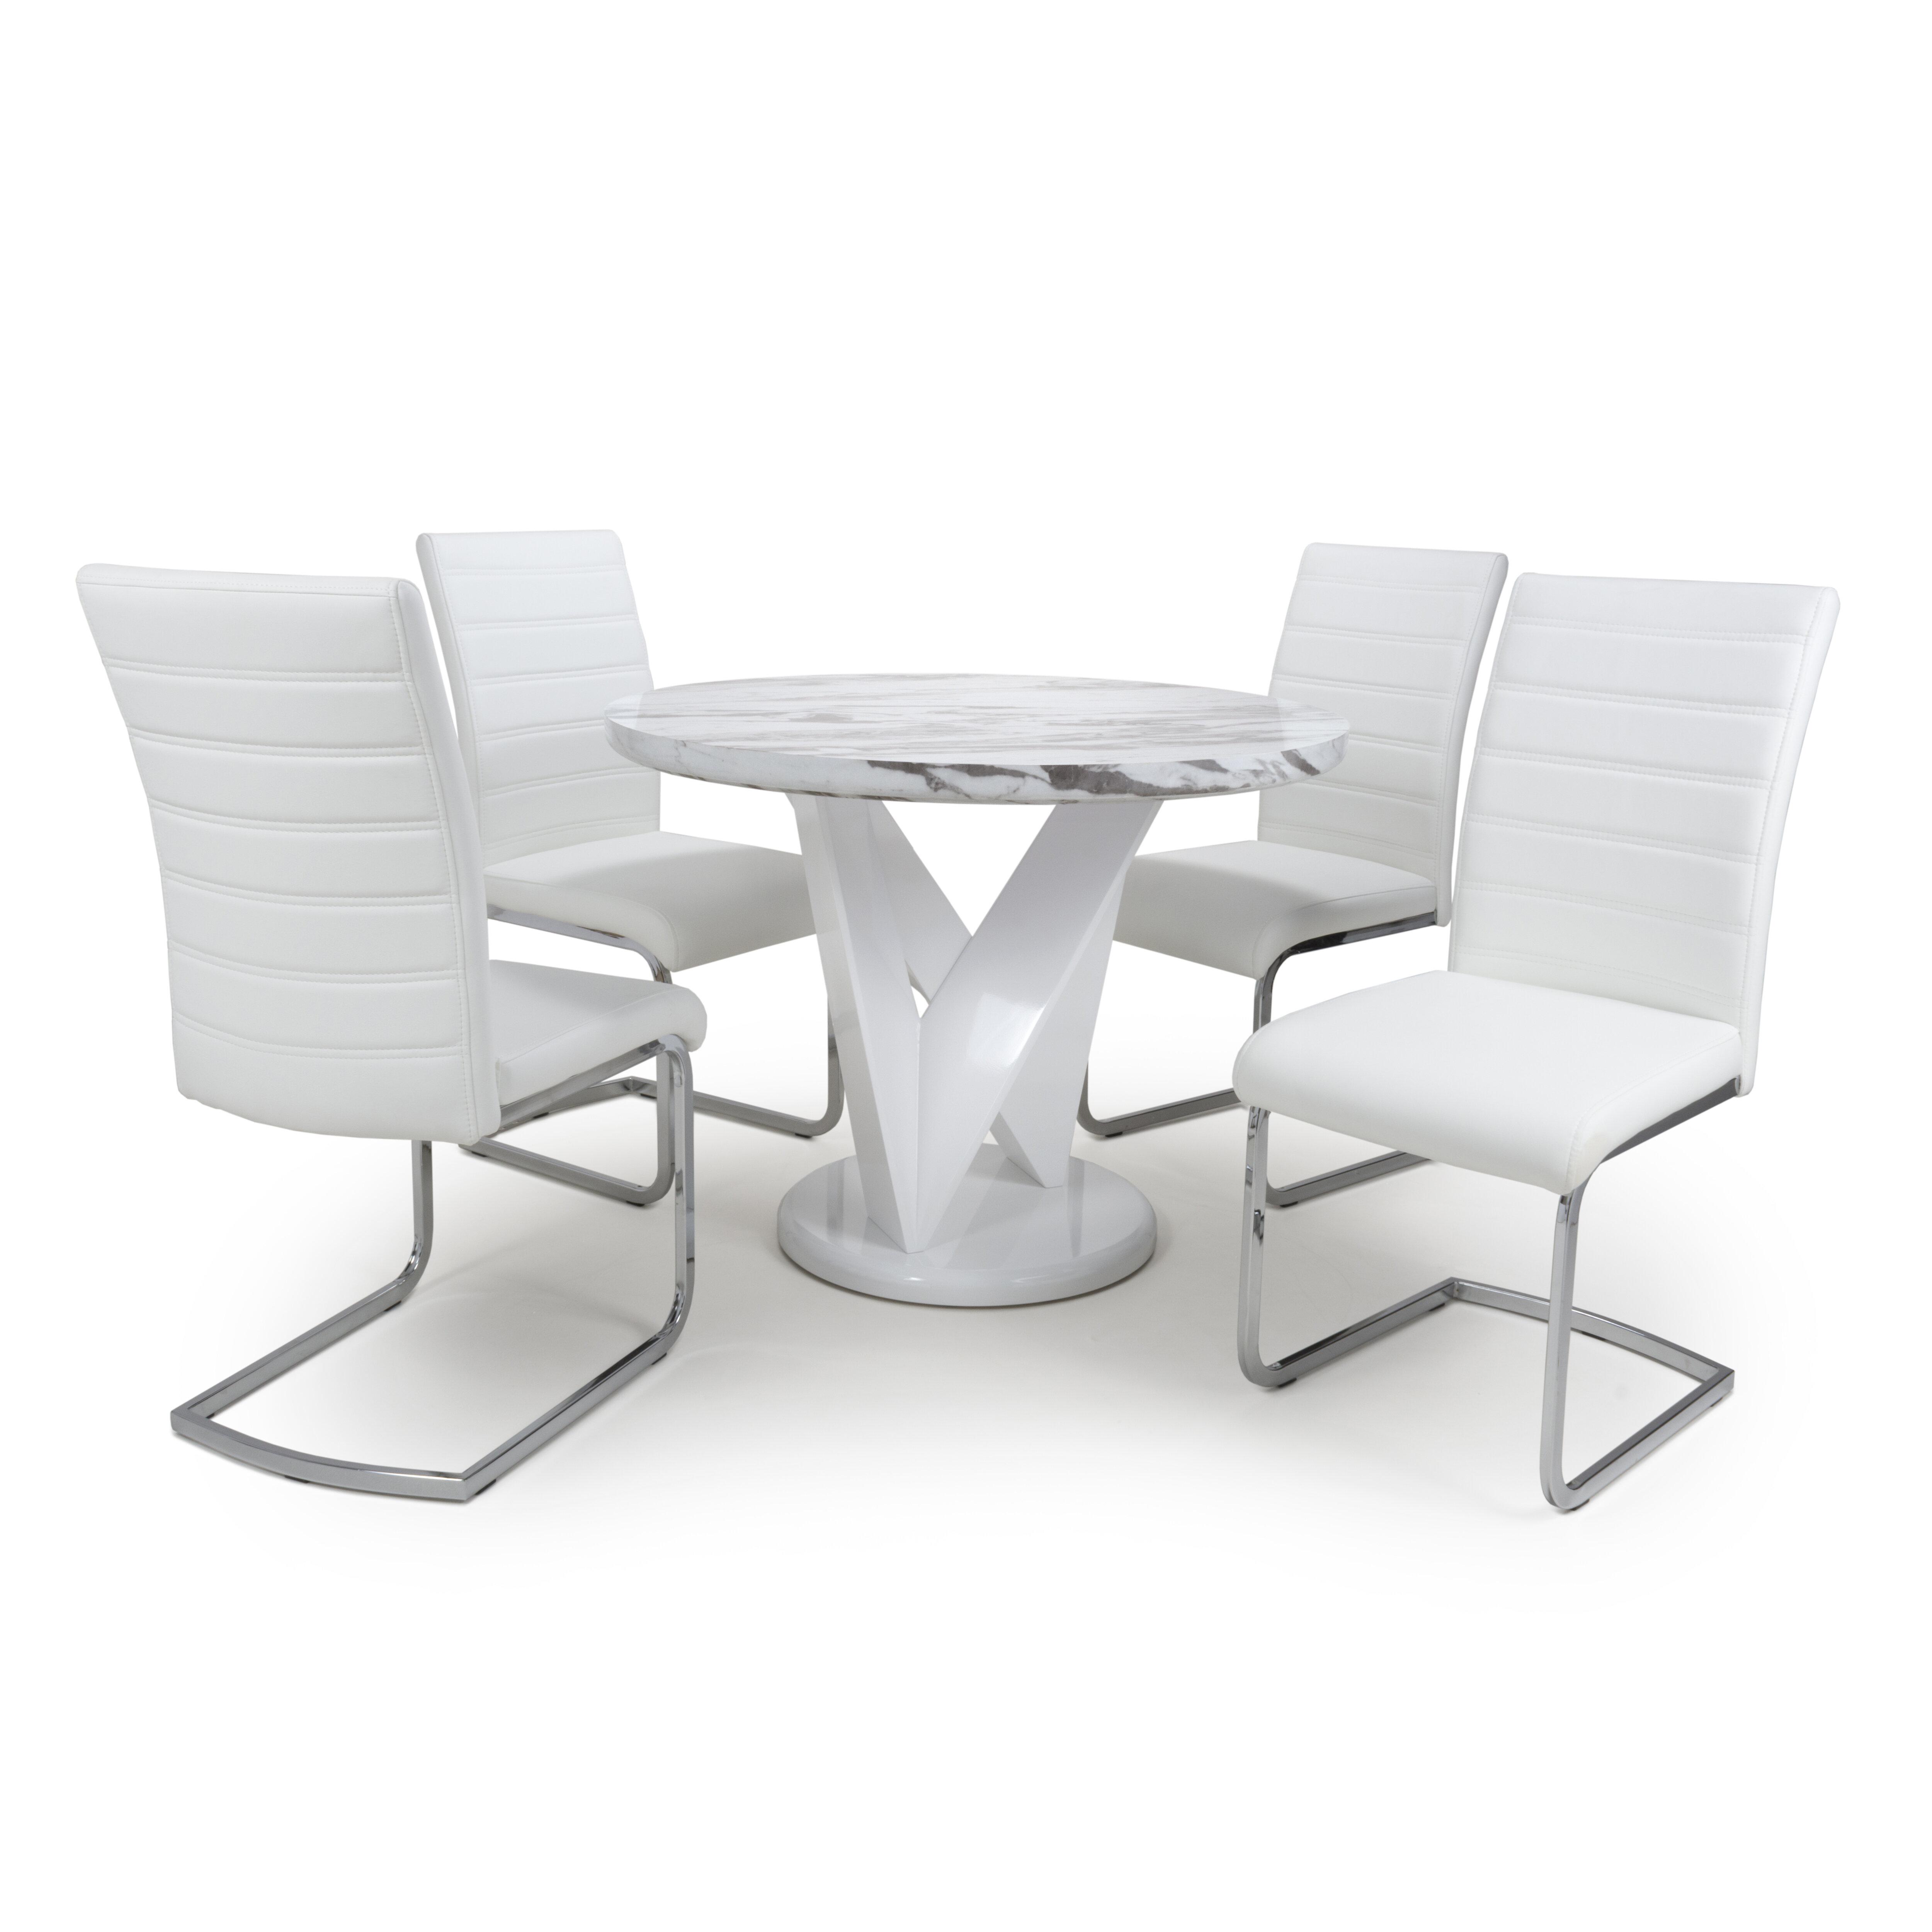 Ivy Bronx Athol Dining Set With 4 Chairs Wayfair Co Uk